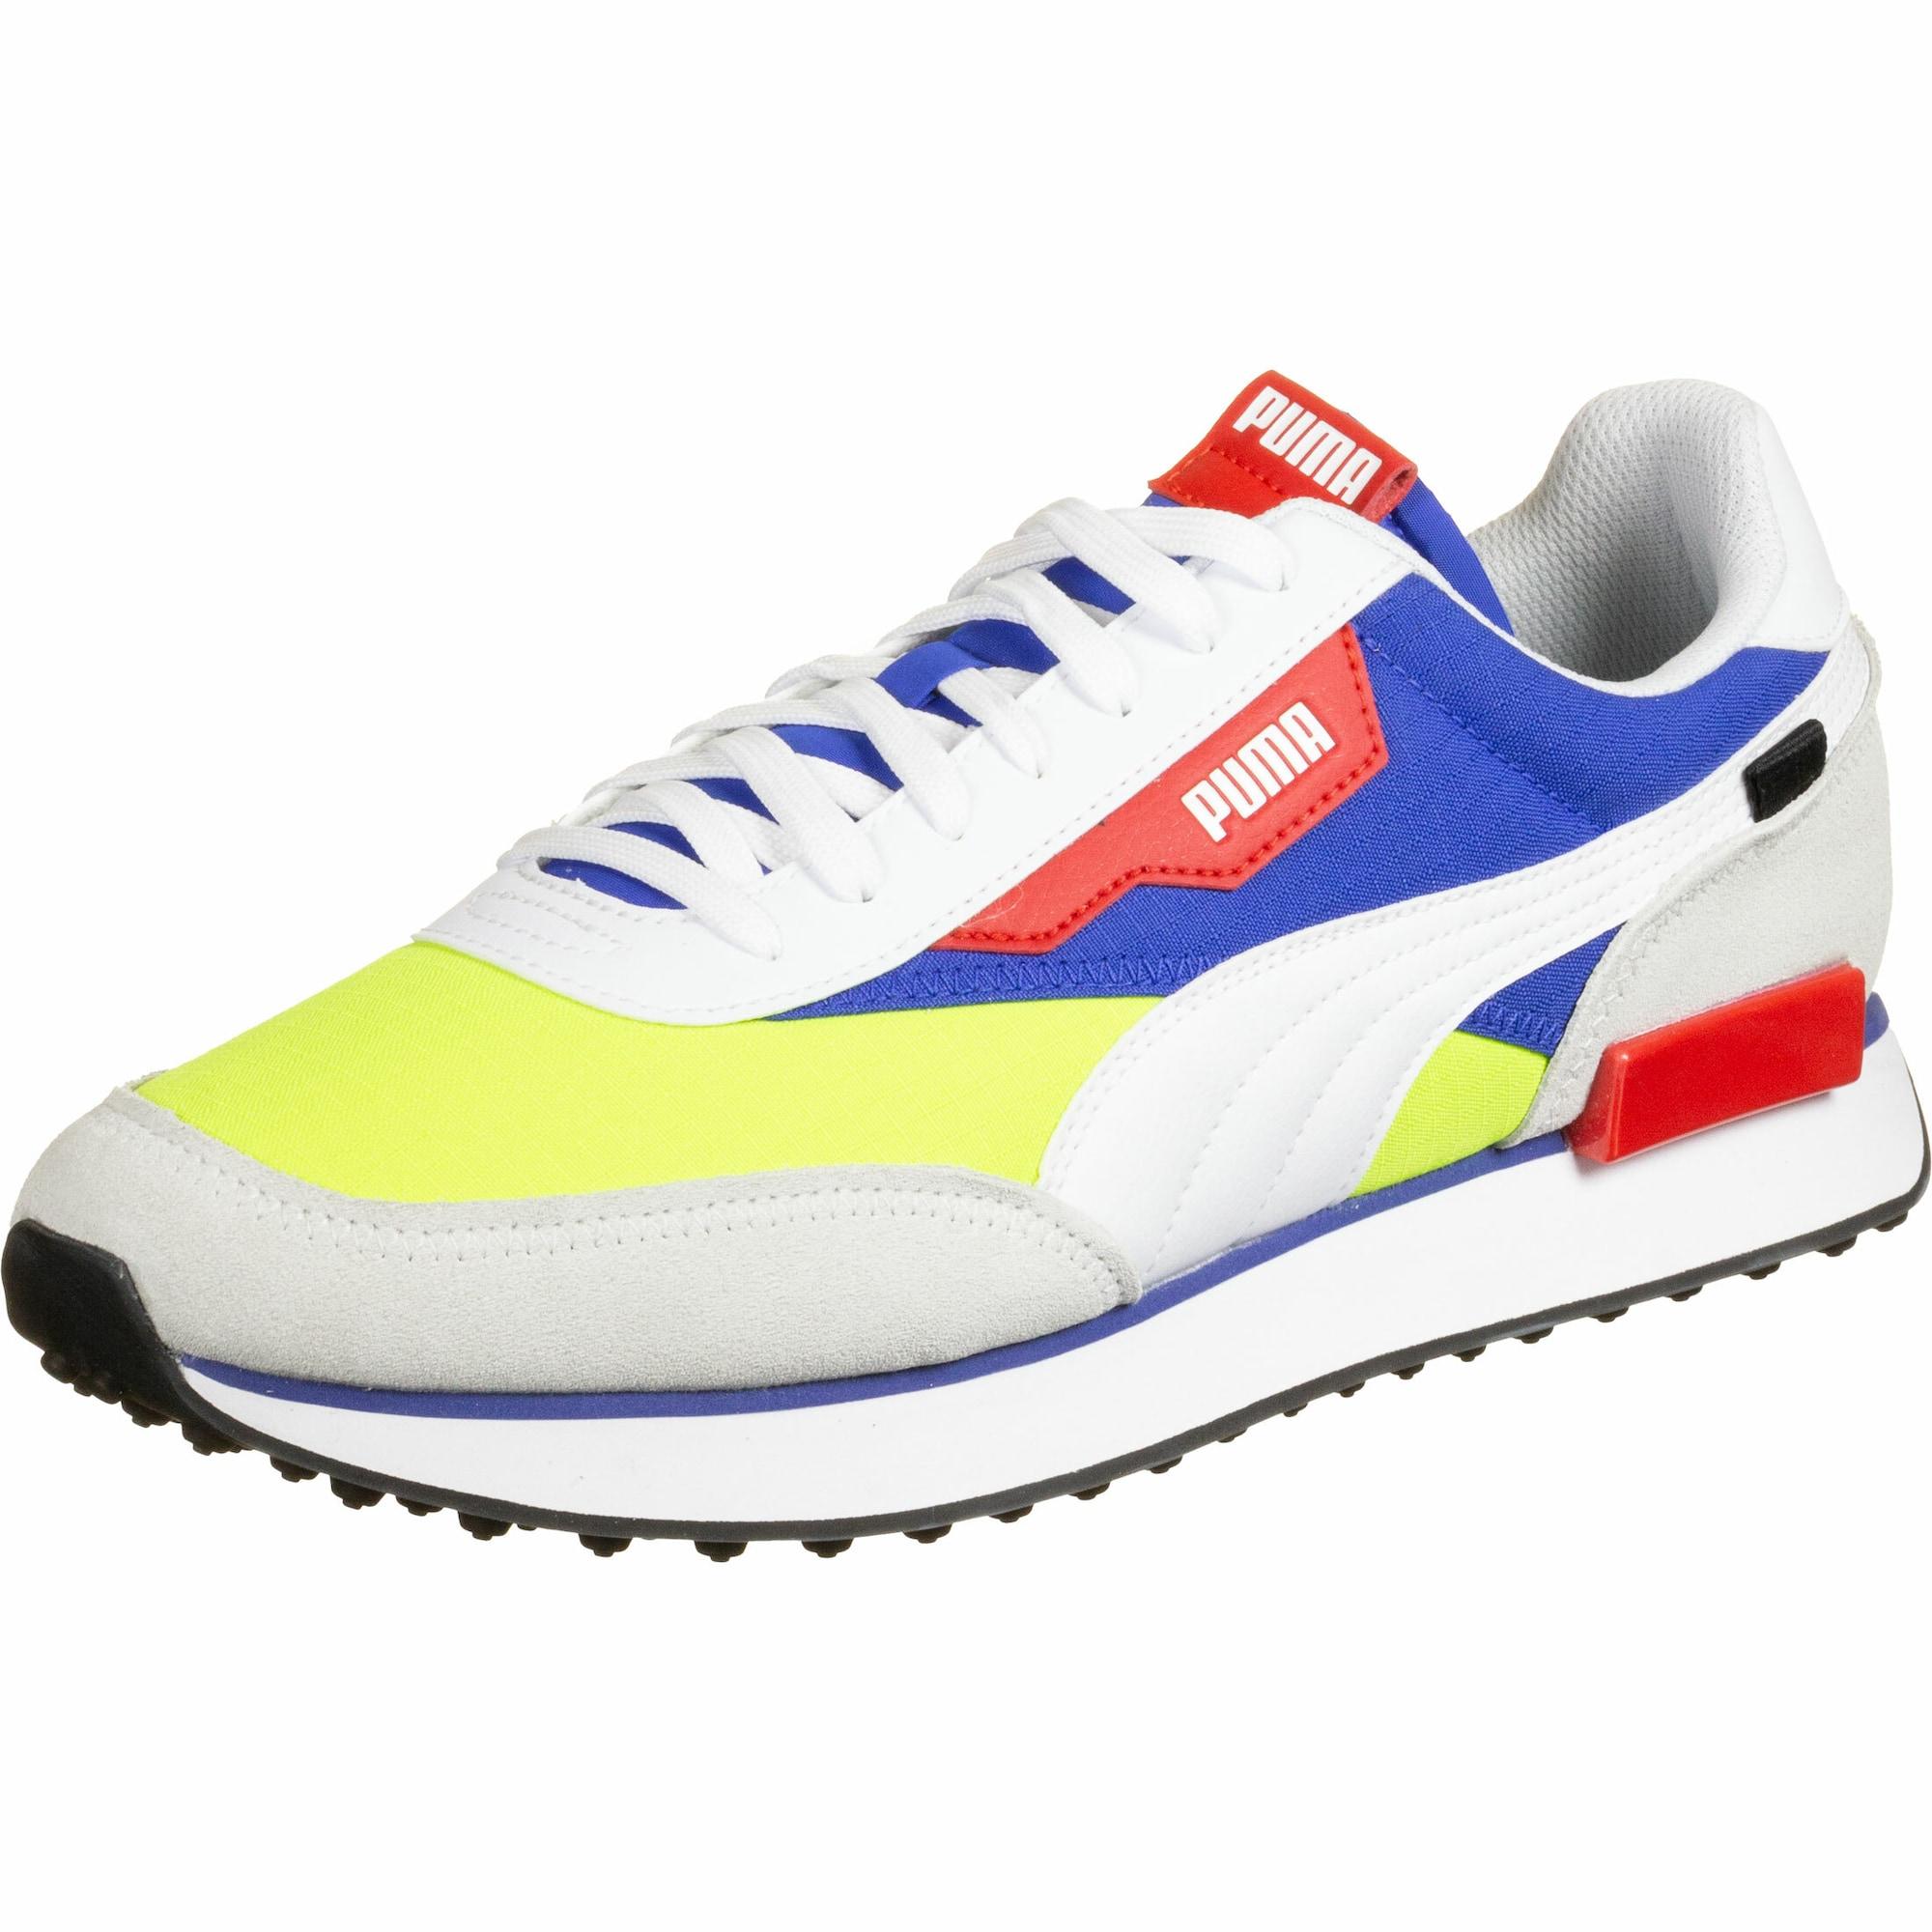 Schuhe ' FUTURE RIDER PLAY ON W '